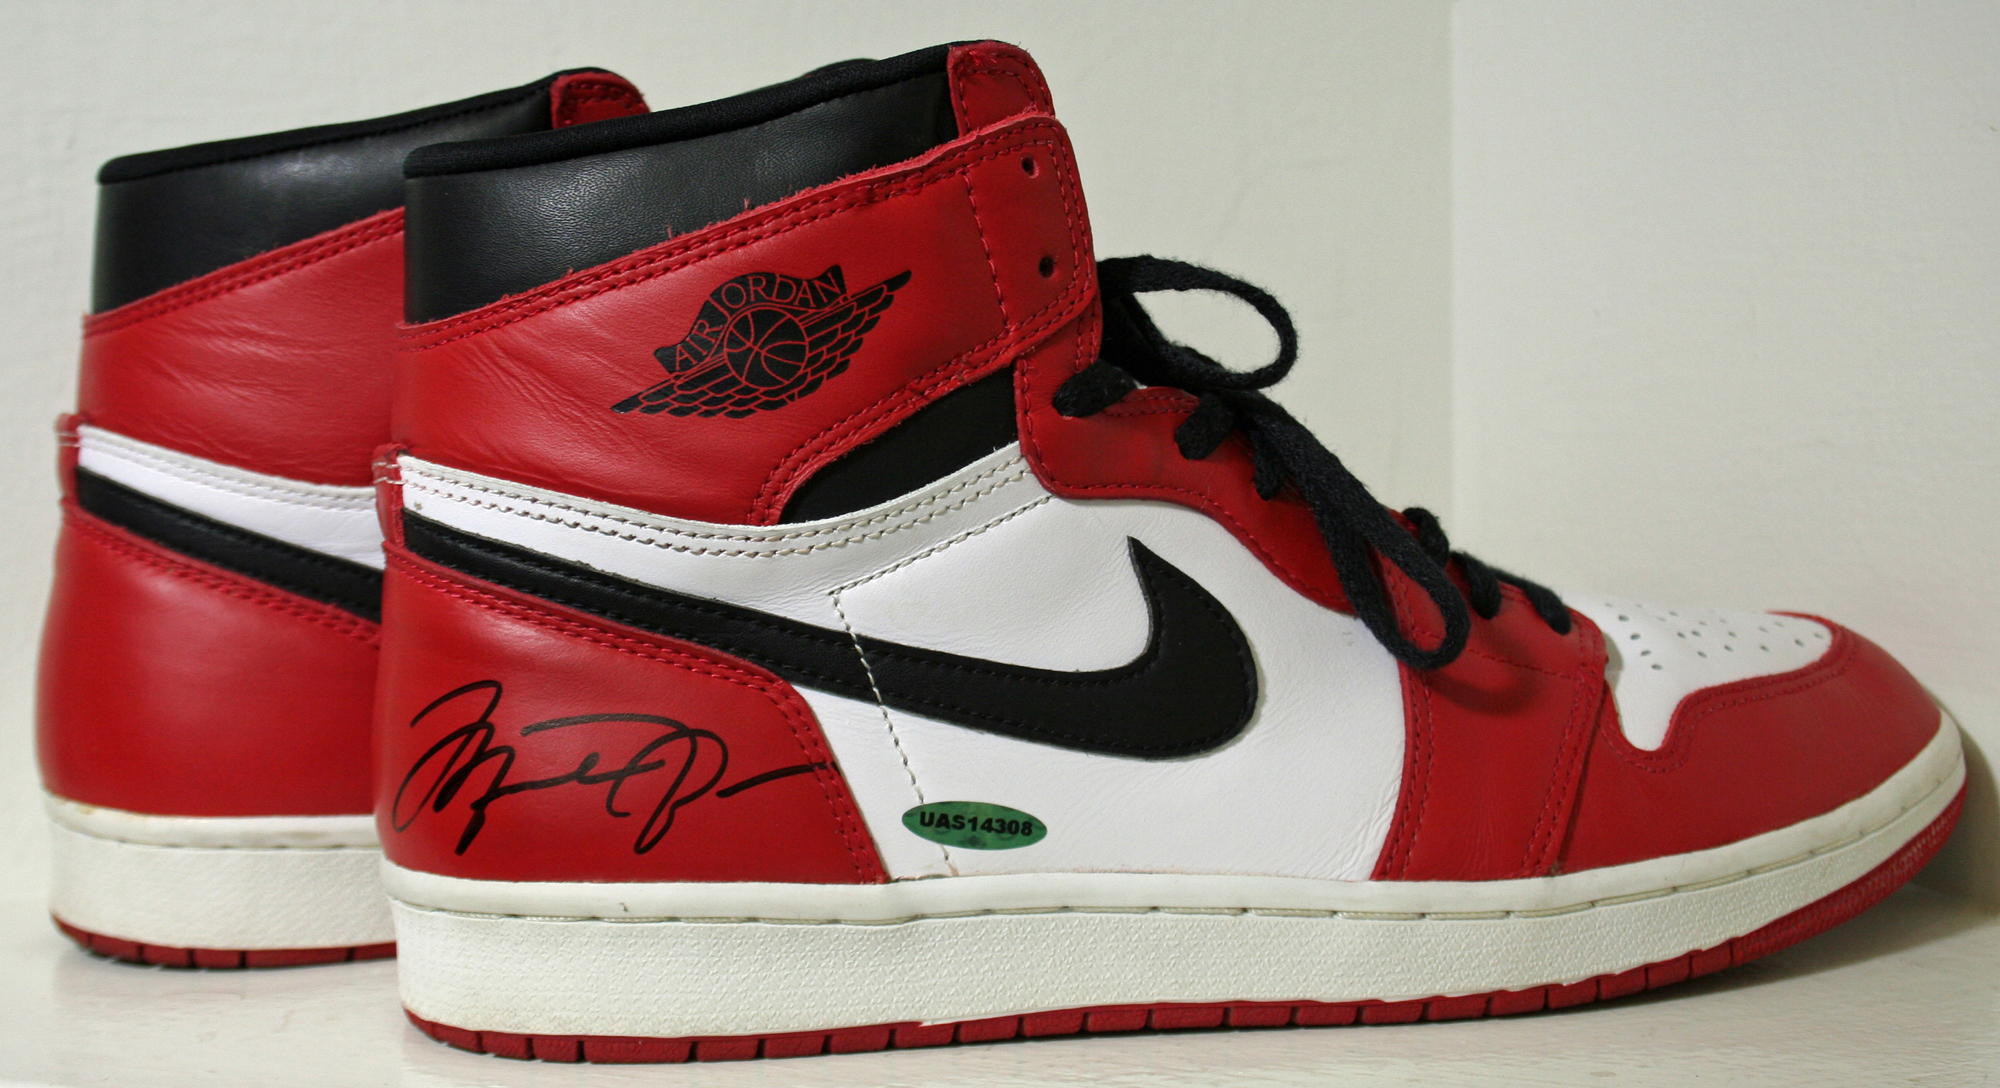 10ed4ccef745 Michael Jordan Dual Signed 1994 Nike Air Jordan 10th Anniversary Re-Issue  Sneakers with Box ...